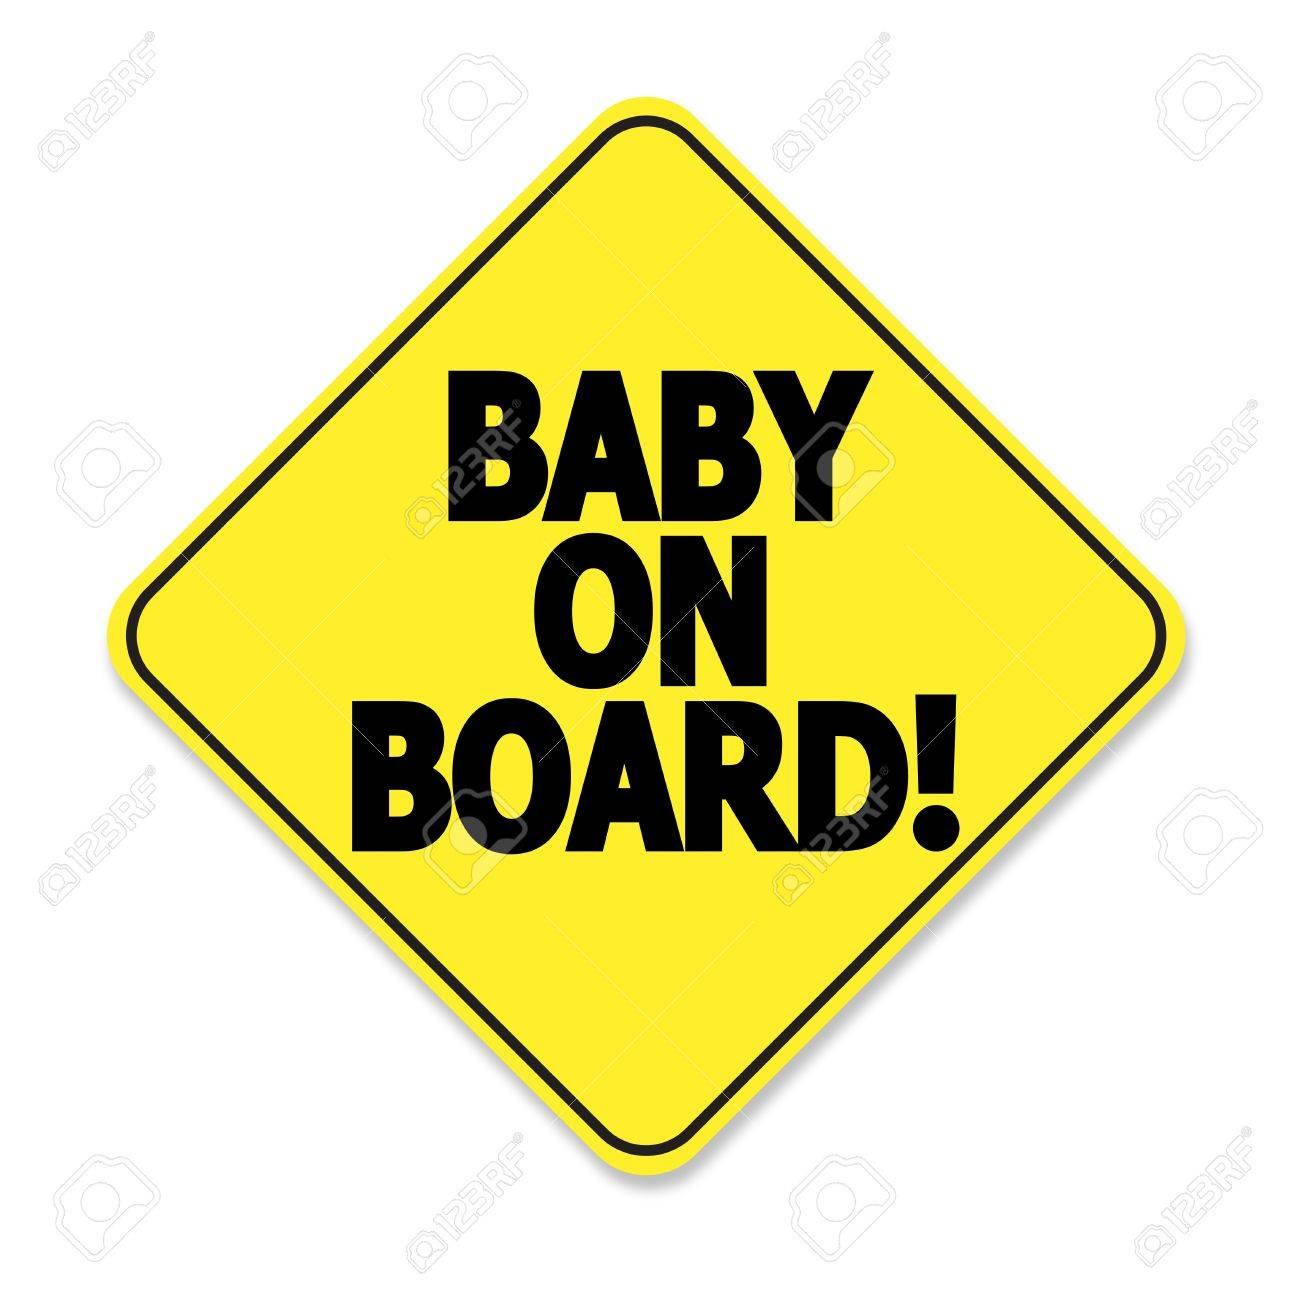 Baby on board Stock Vector - 10529509